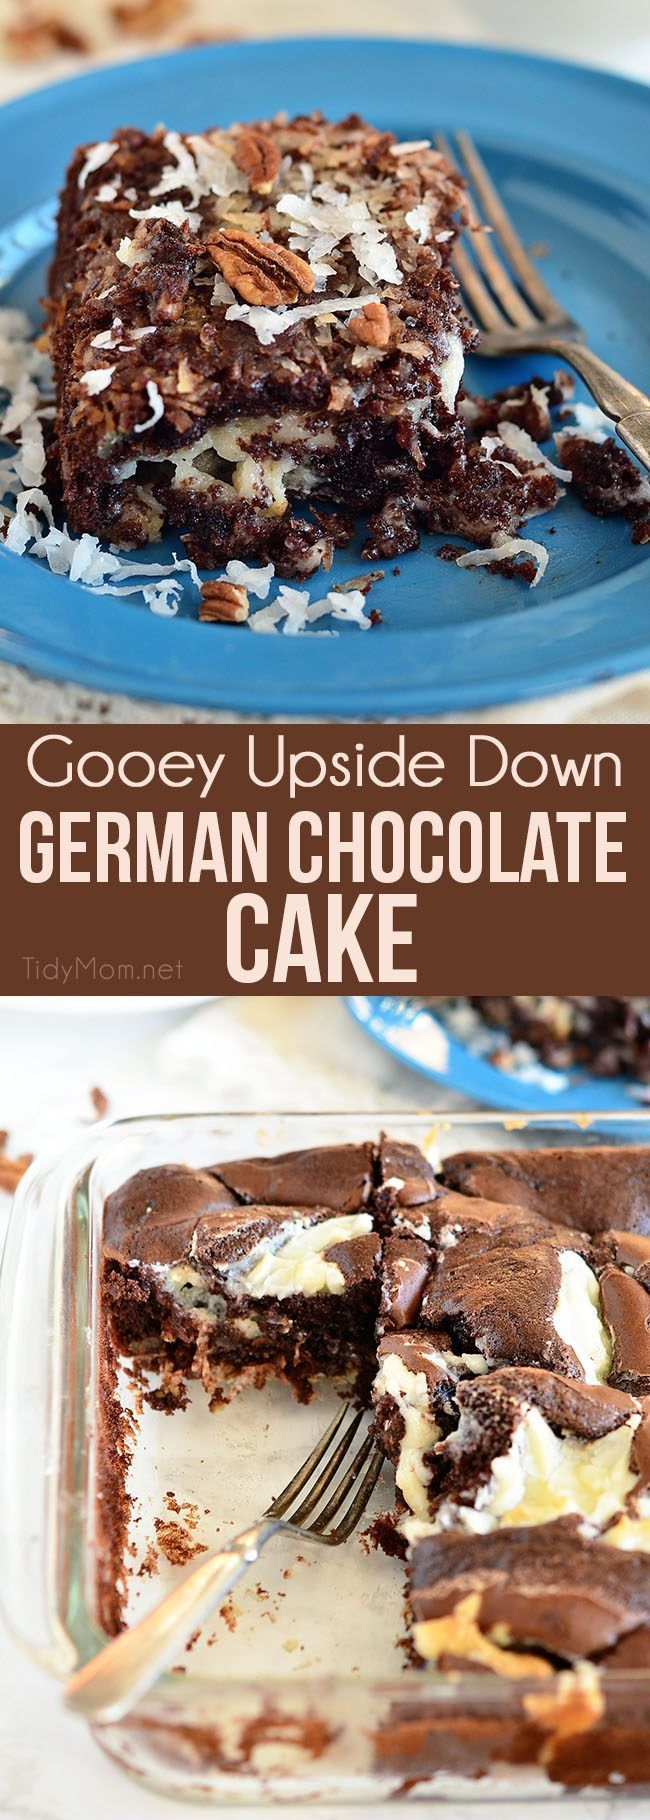 Doctor up german chocolate cake mix